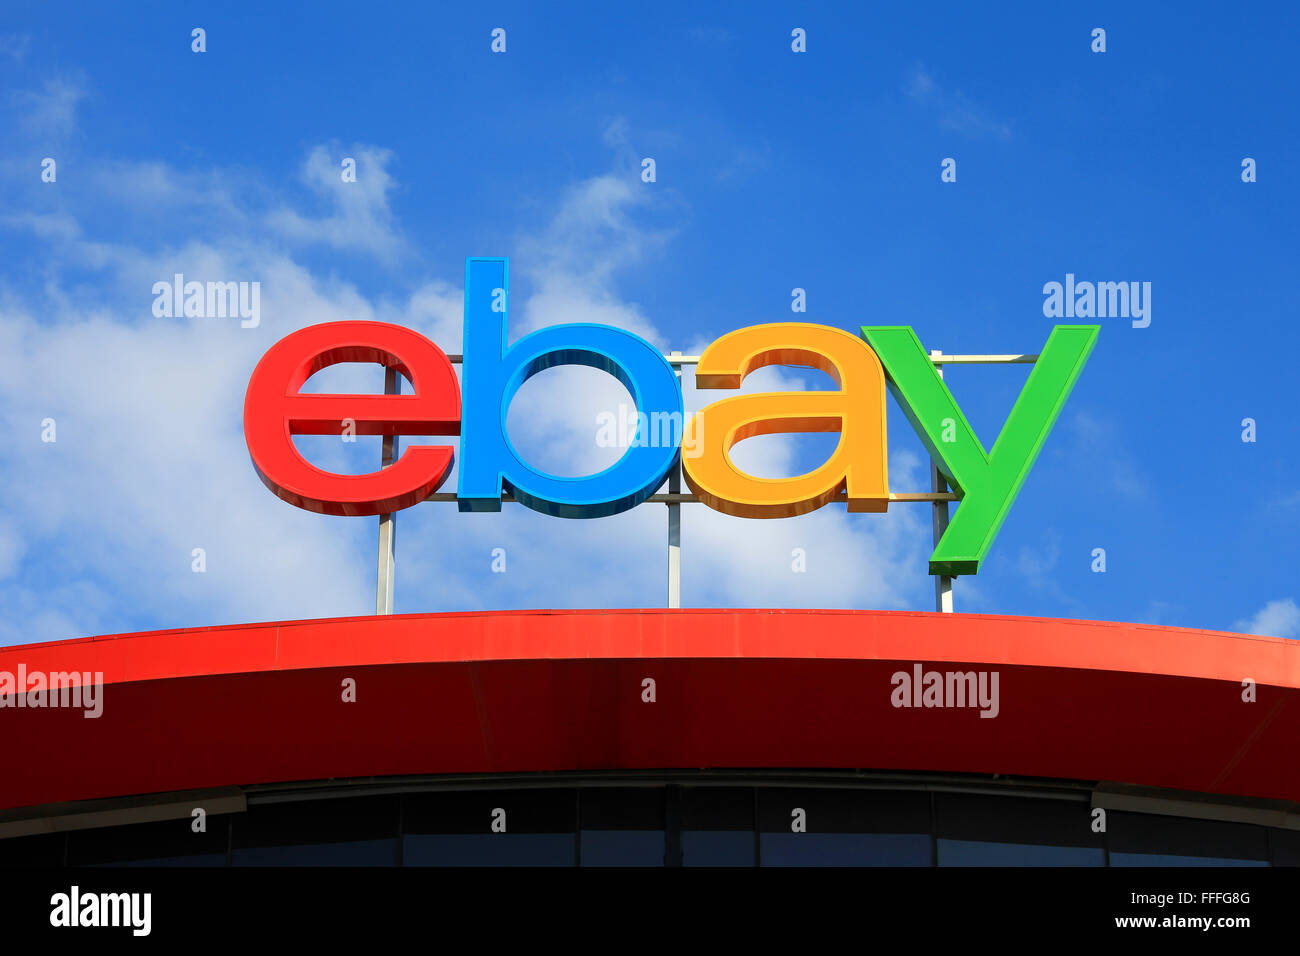 Ebay logo, ebay is an American multinational corporation and e-commerce company, providing consumer-to-consumer - Stock Image